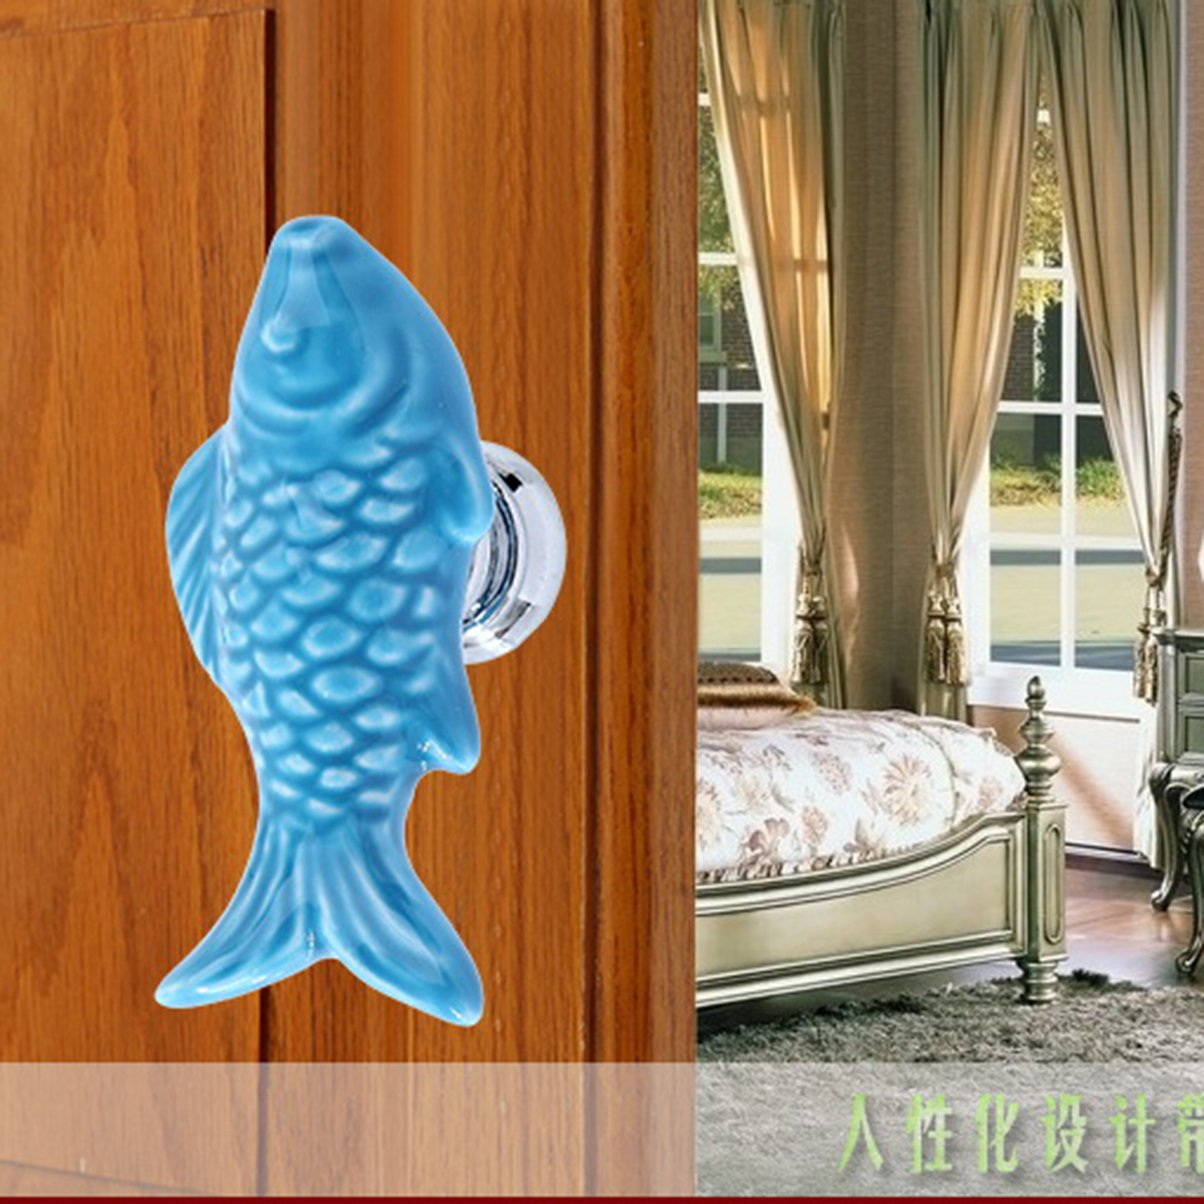 Carp Fish Shape Door Drawer Bin Handle Pull Knob Hardware Blue Generic